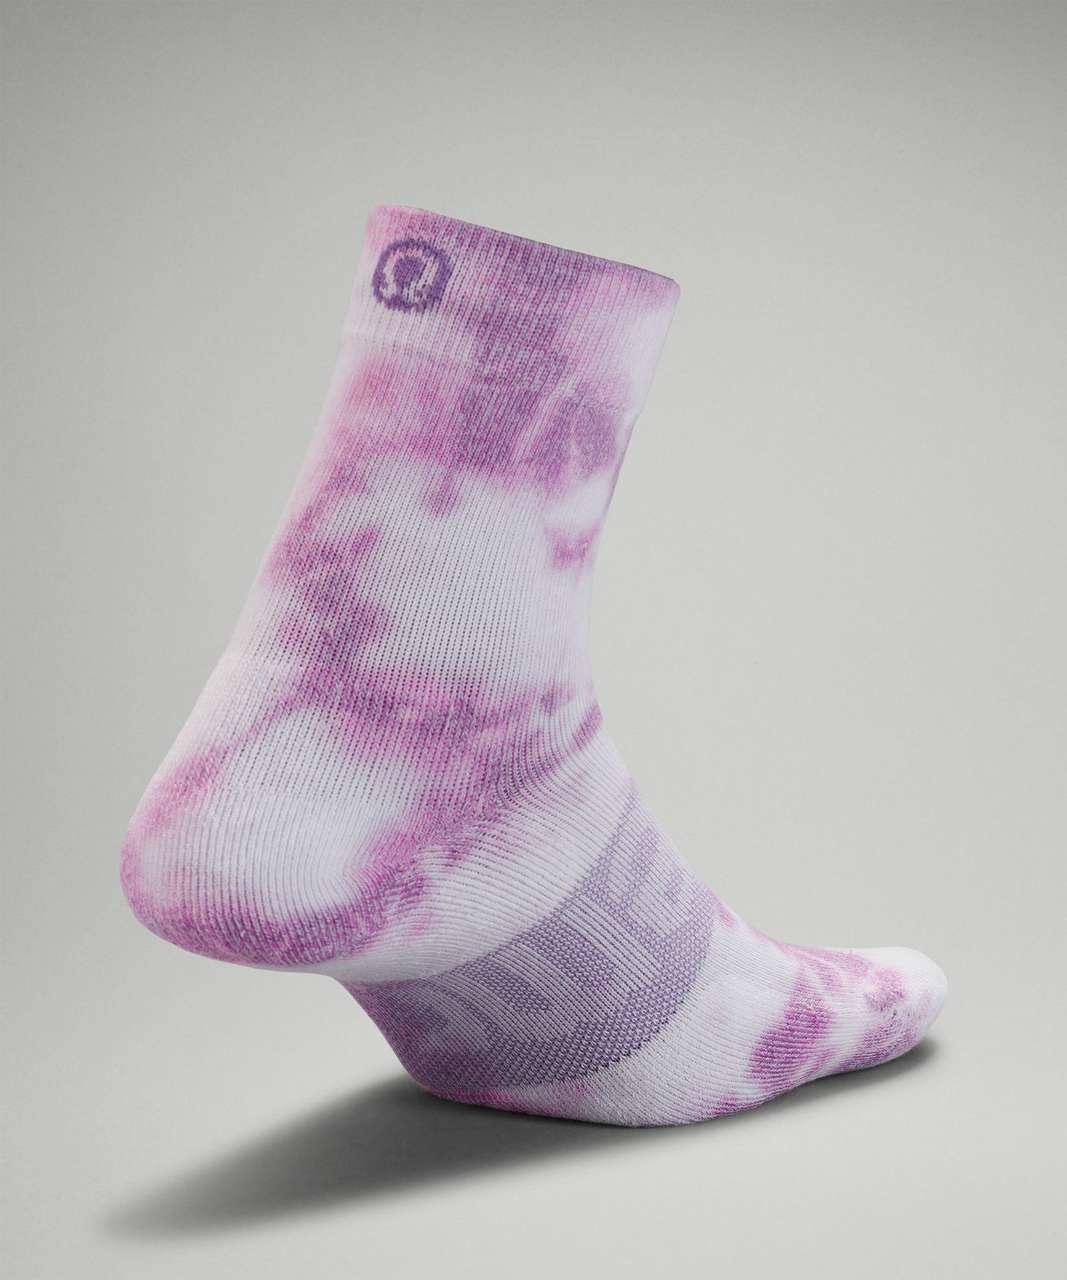 Lululemon Daily Stride Mid-Crew Tie Dye Sock - Wisteria Purple